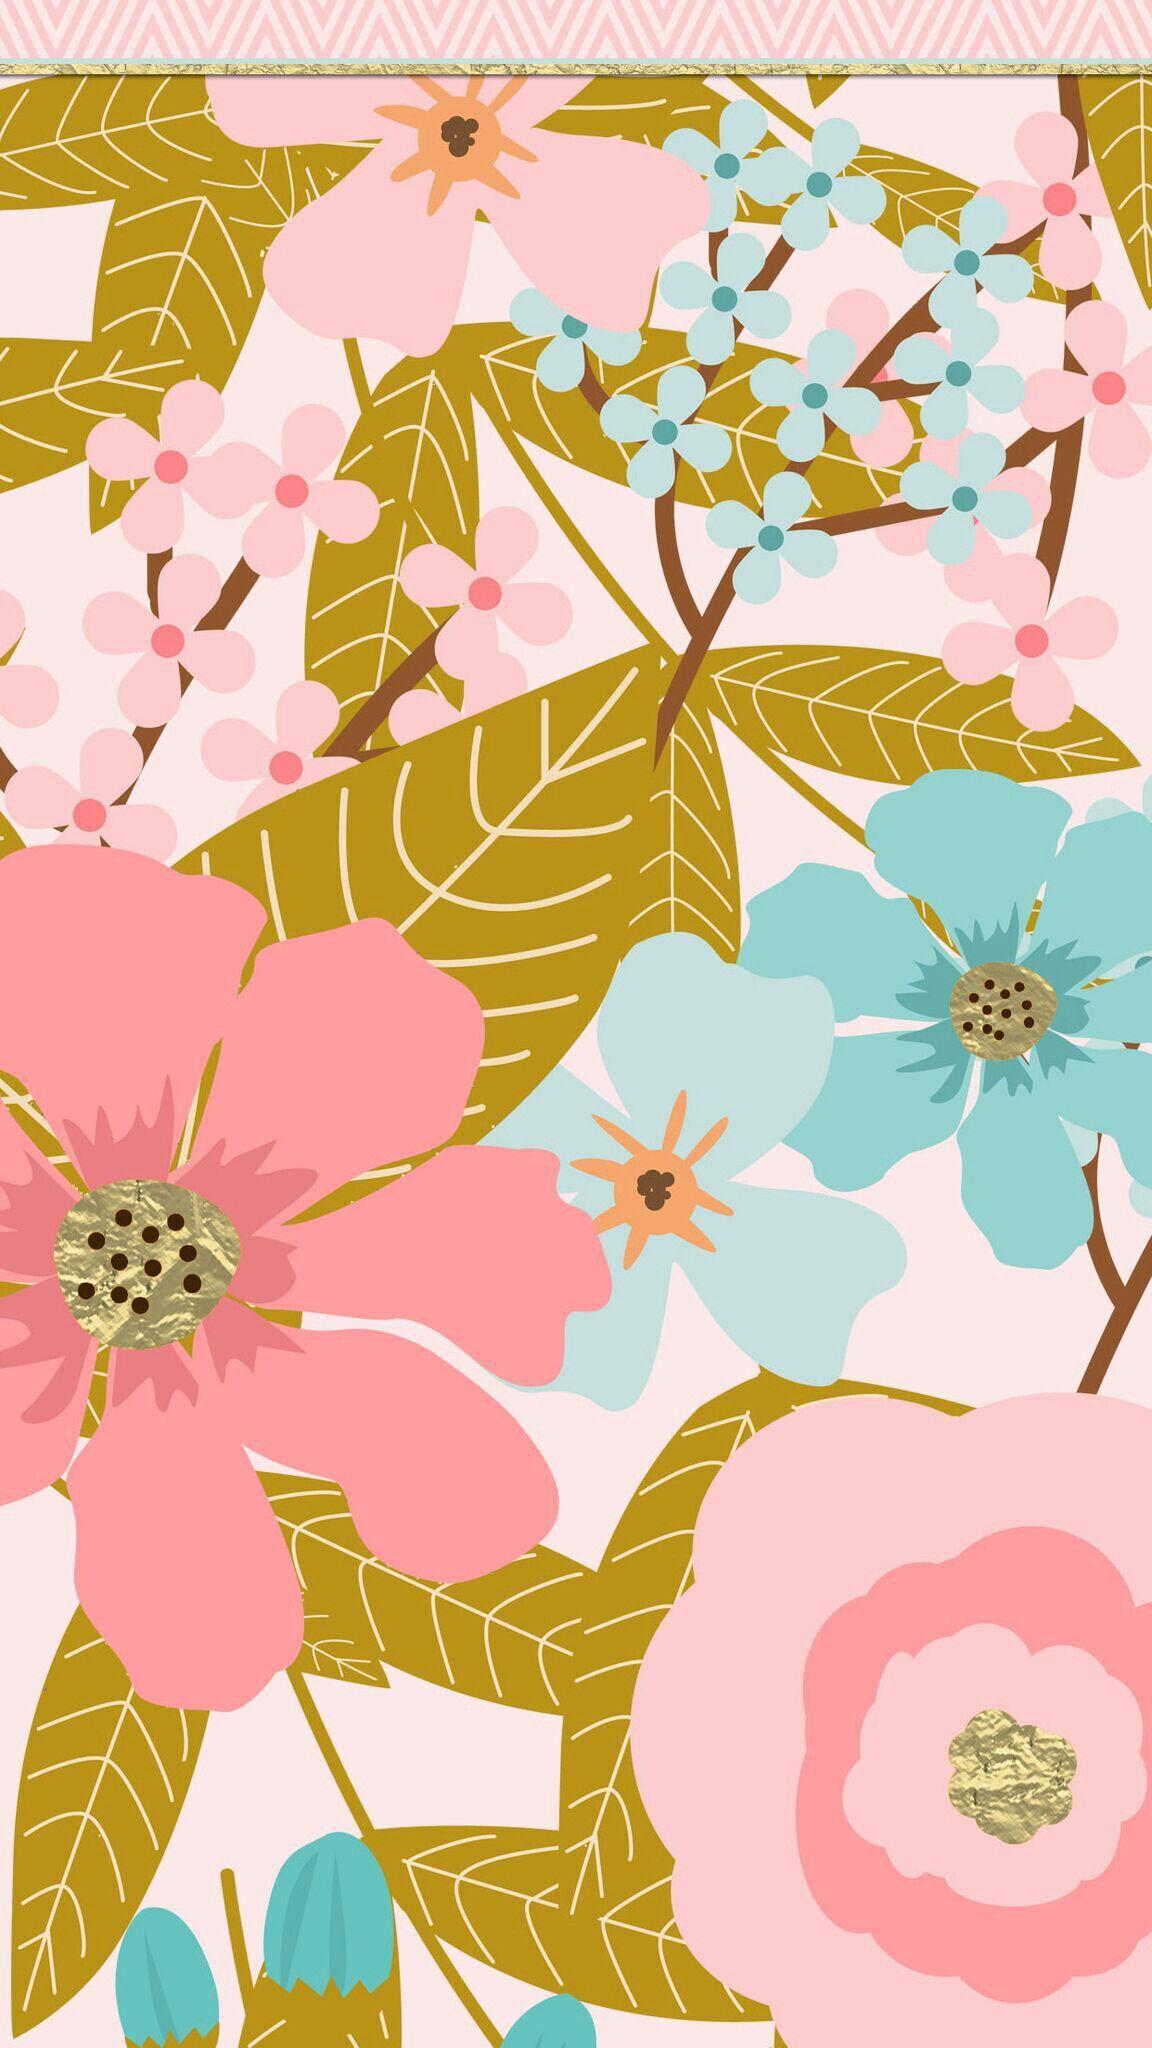 Pin by dhenok basuki on flower pinterest walls wallpaper and